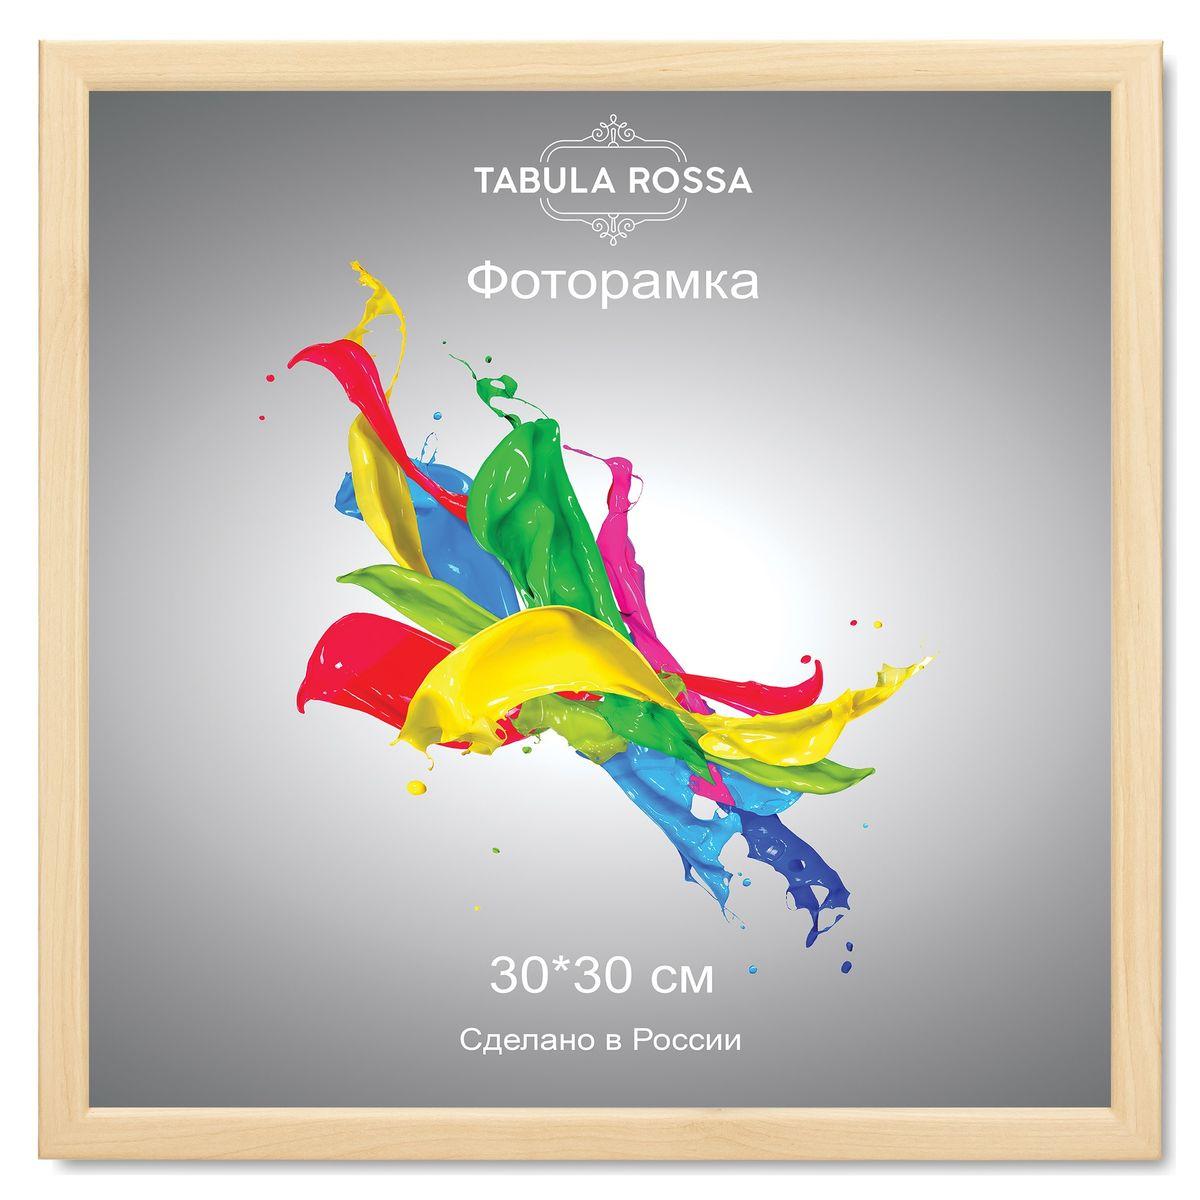 Фоторамка Tabula Rossa, цвет: клен, 30 х 30 см. ТР 5138 фоторамки tabula rossa фоторамка 13х18 455